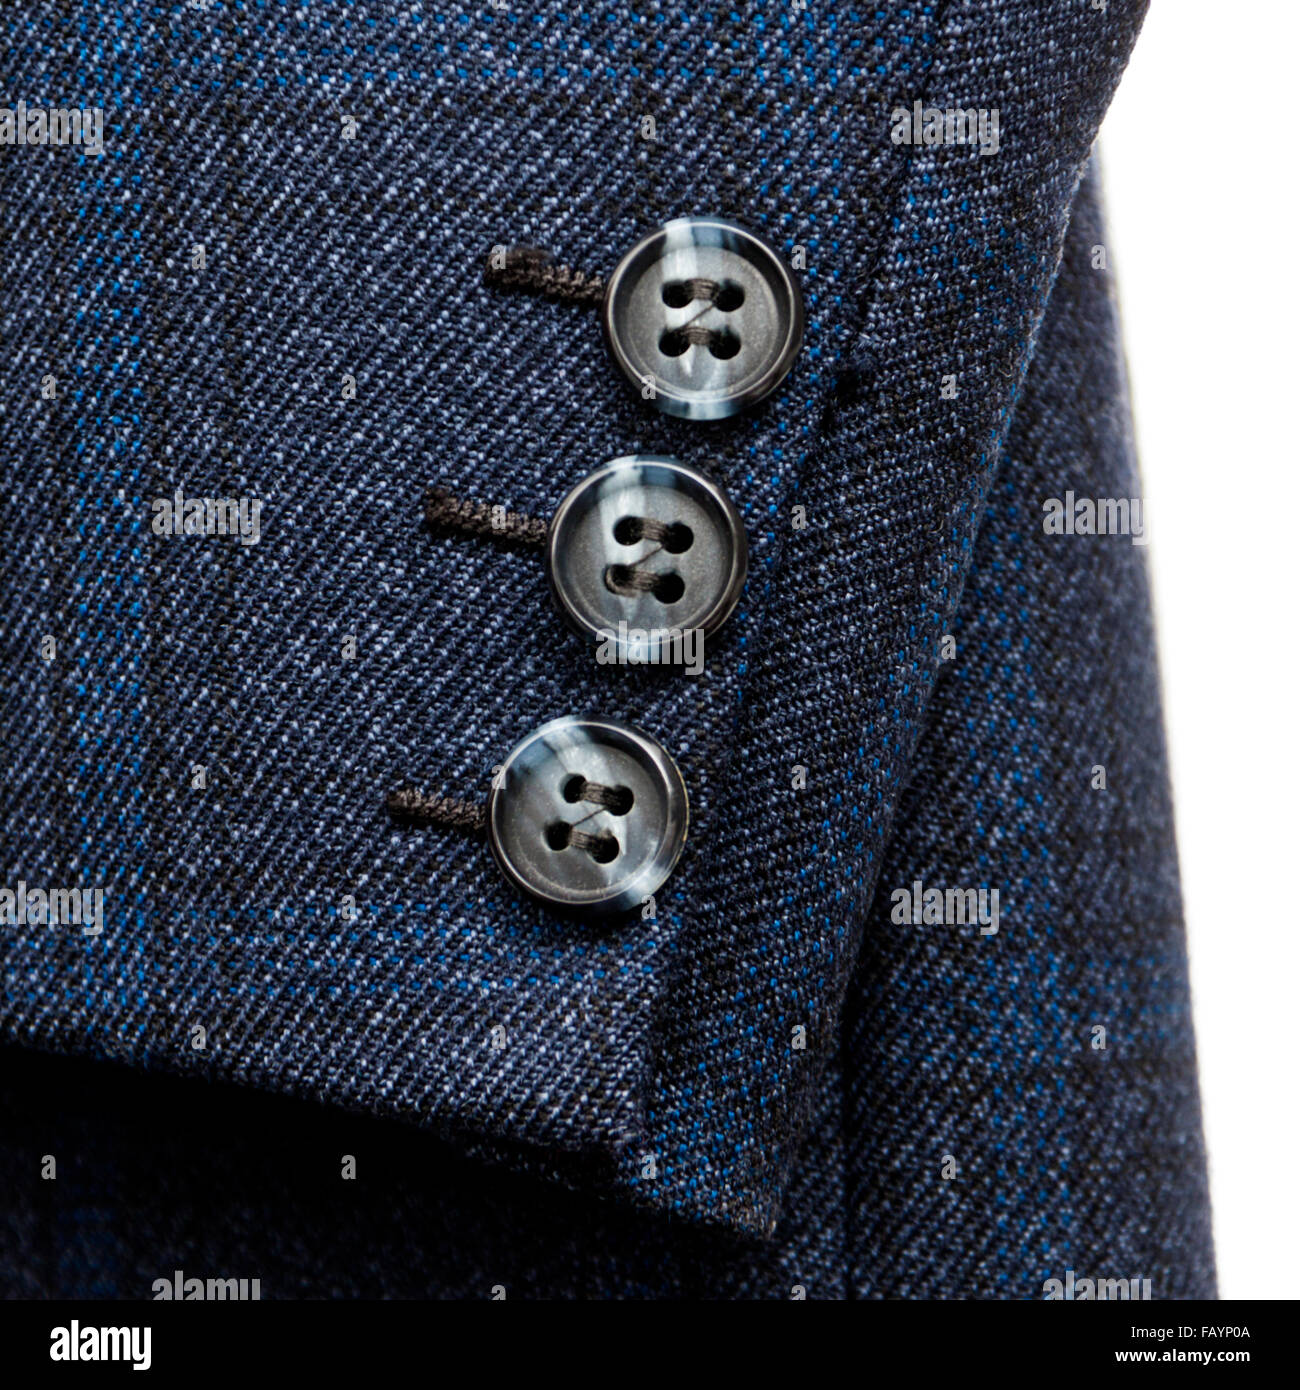 Vintage British tailored jacket by Trent English Tailoring - Stock Image